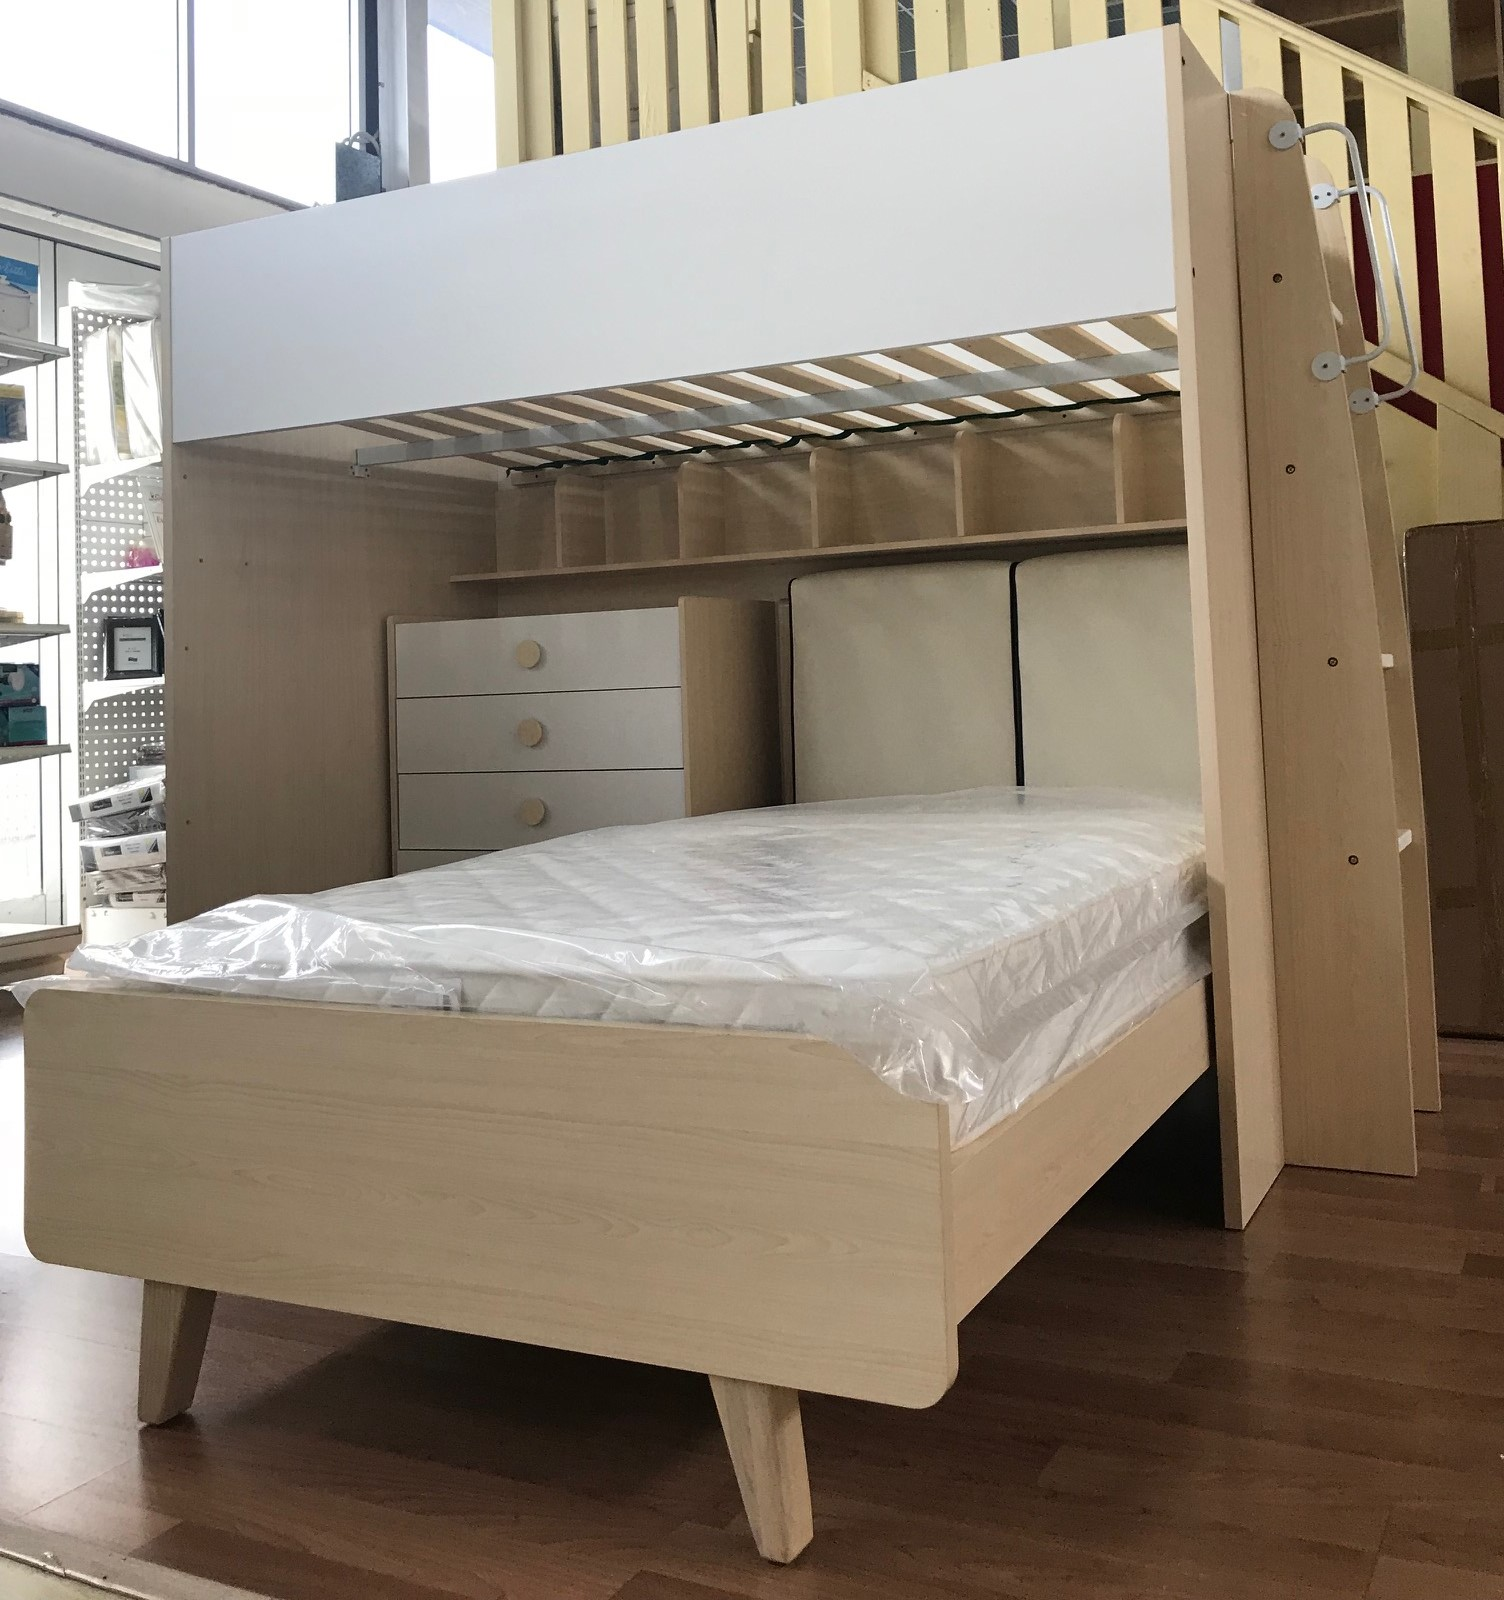 Fashion Bunk Bed K Single Amp Fashion K S Bed Amp Fashion Cod